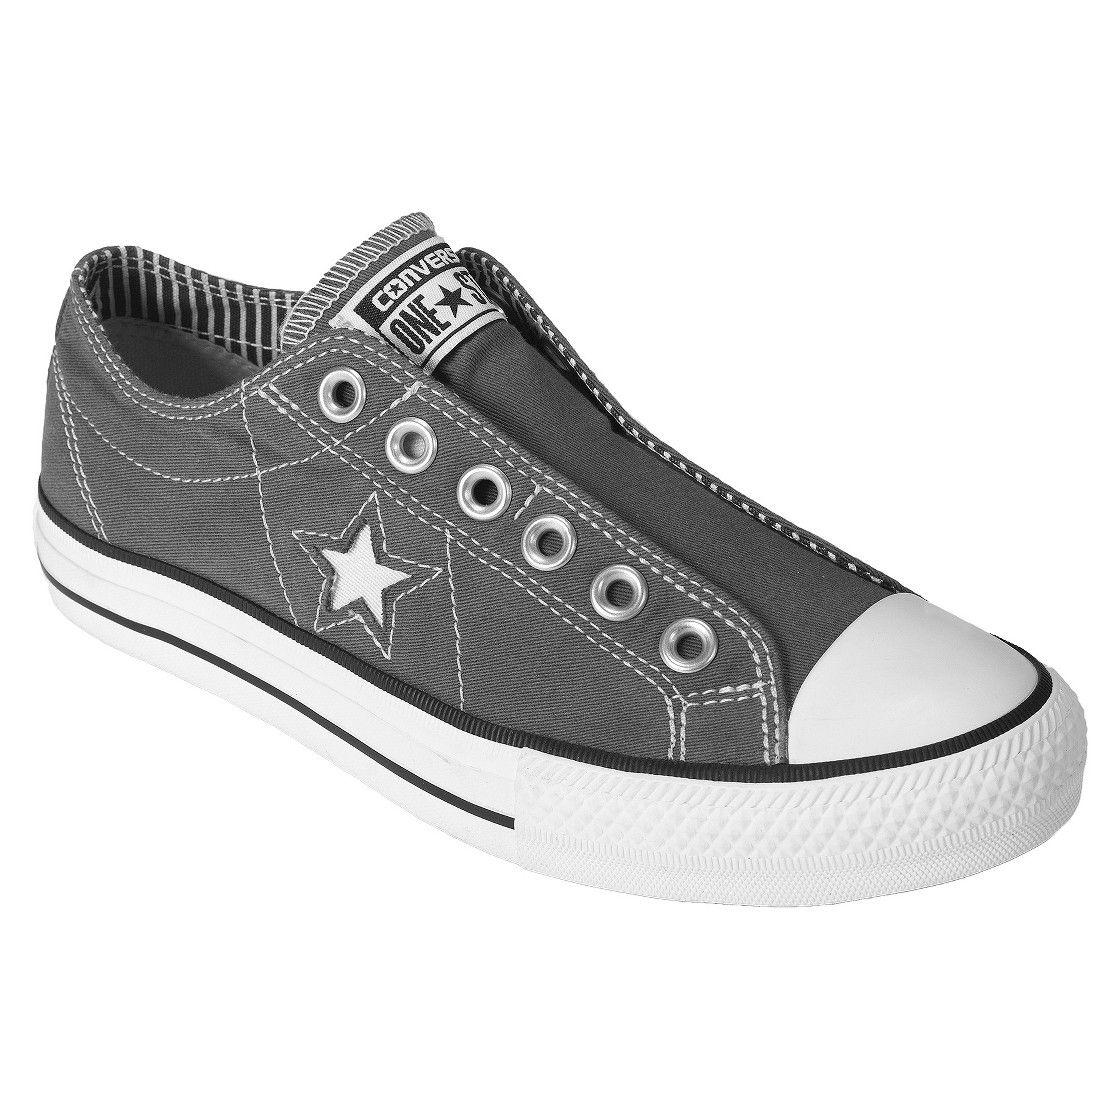 8ac3c25b33816d Women s Converse  One Star  Laceless Slip-on - Grey